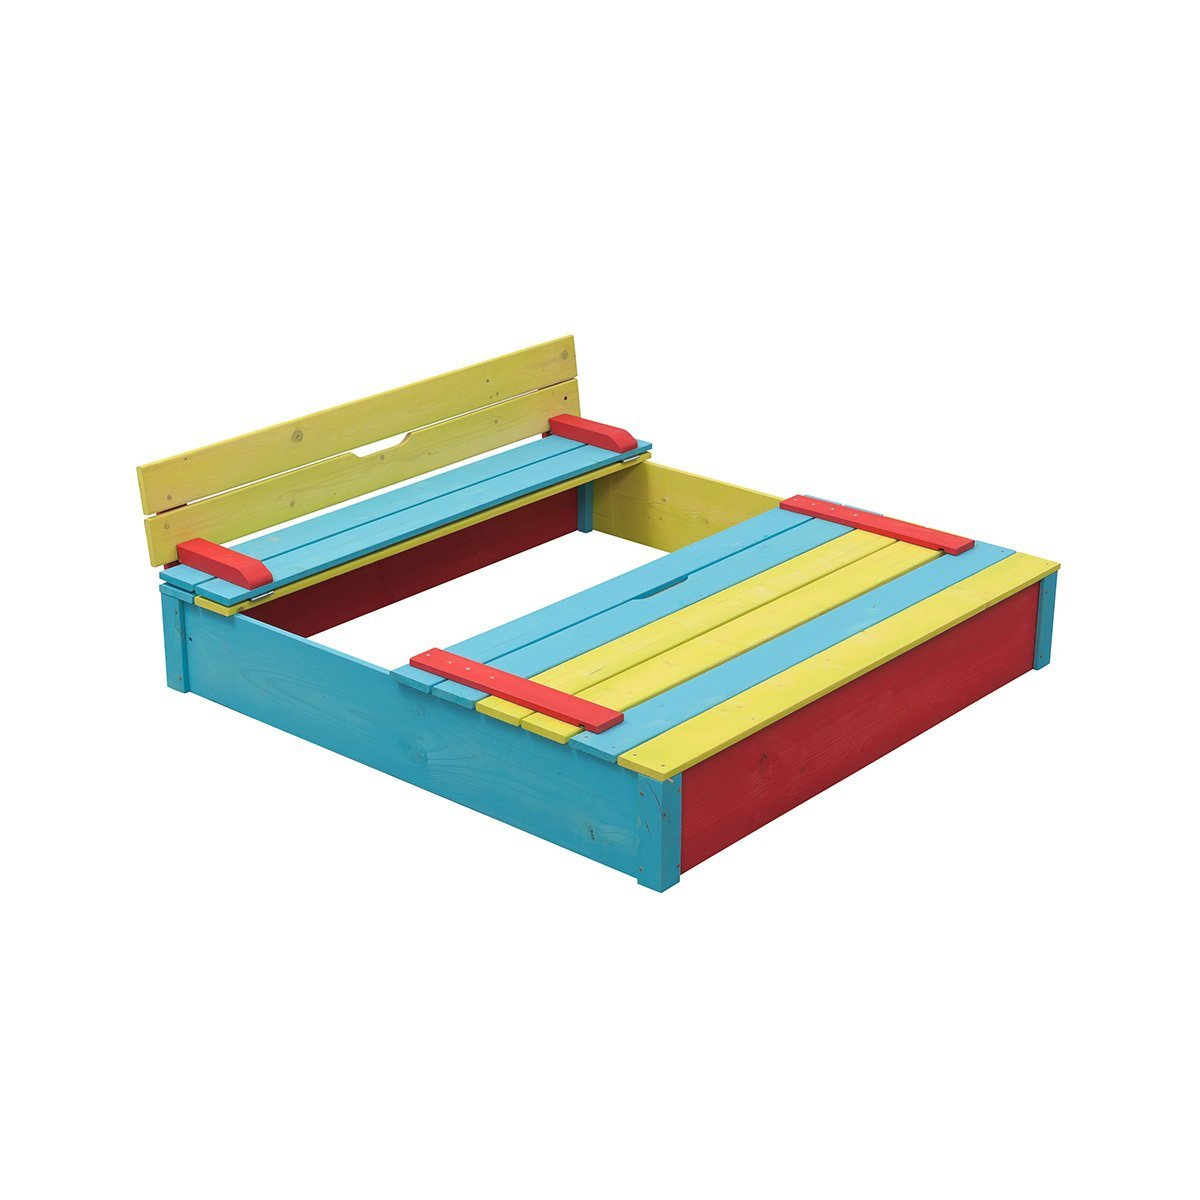 Swing King bunter Sandkasten aus Holz 7850035